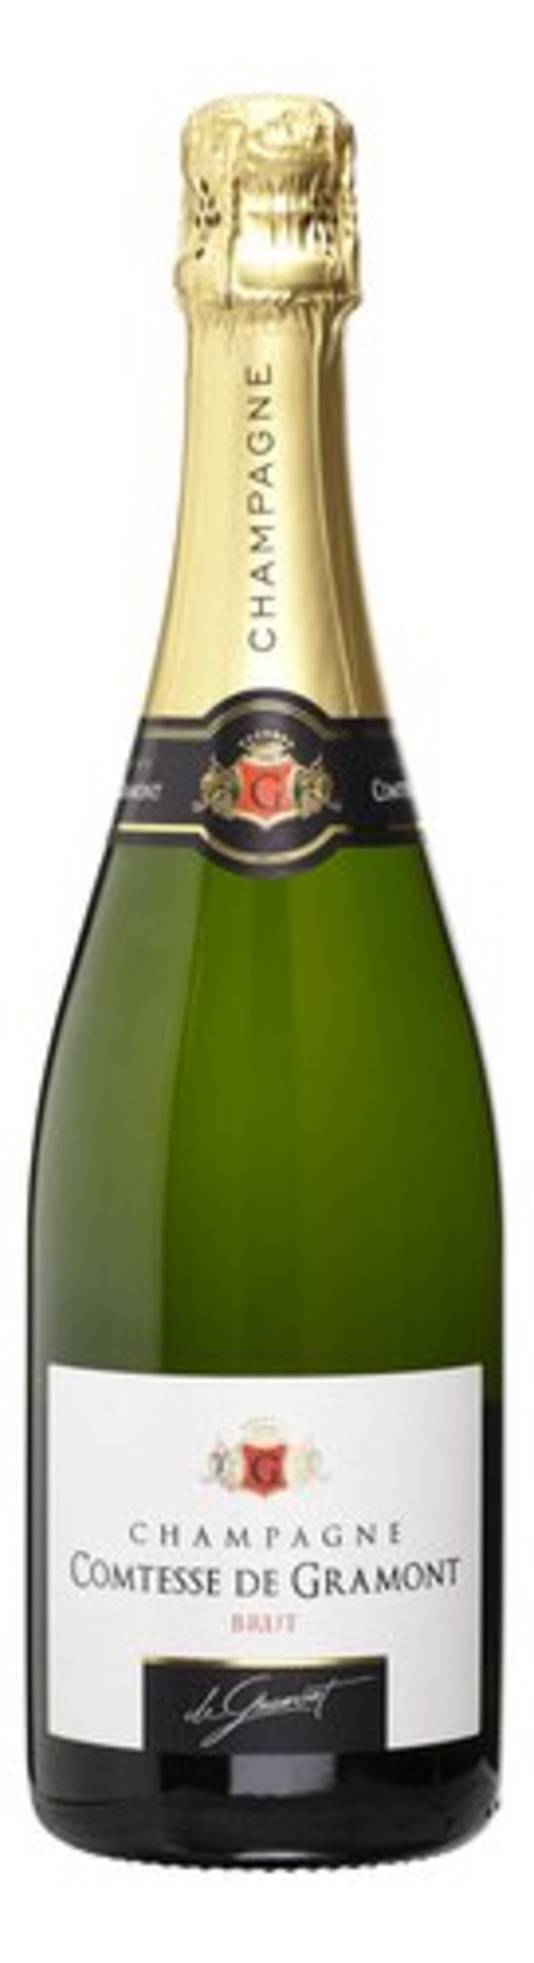 Champagne Comtesse de Gramont